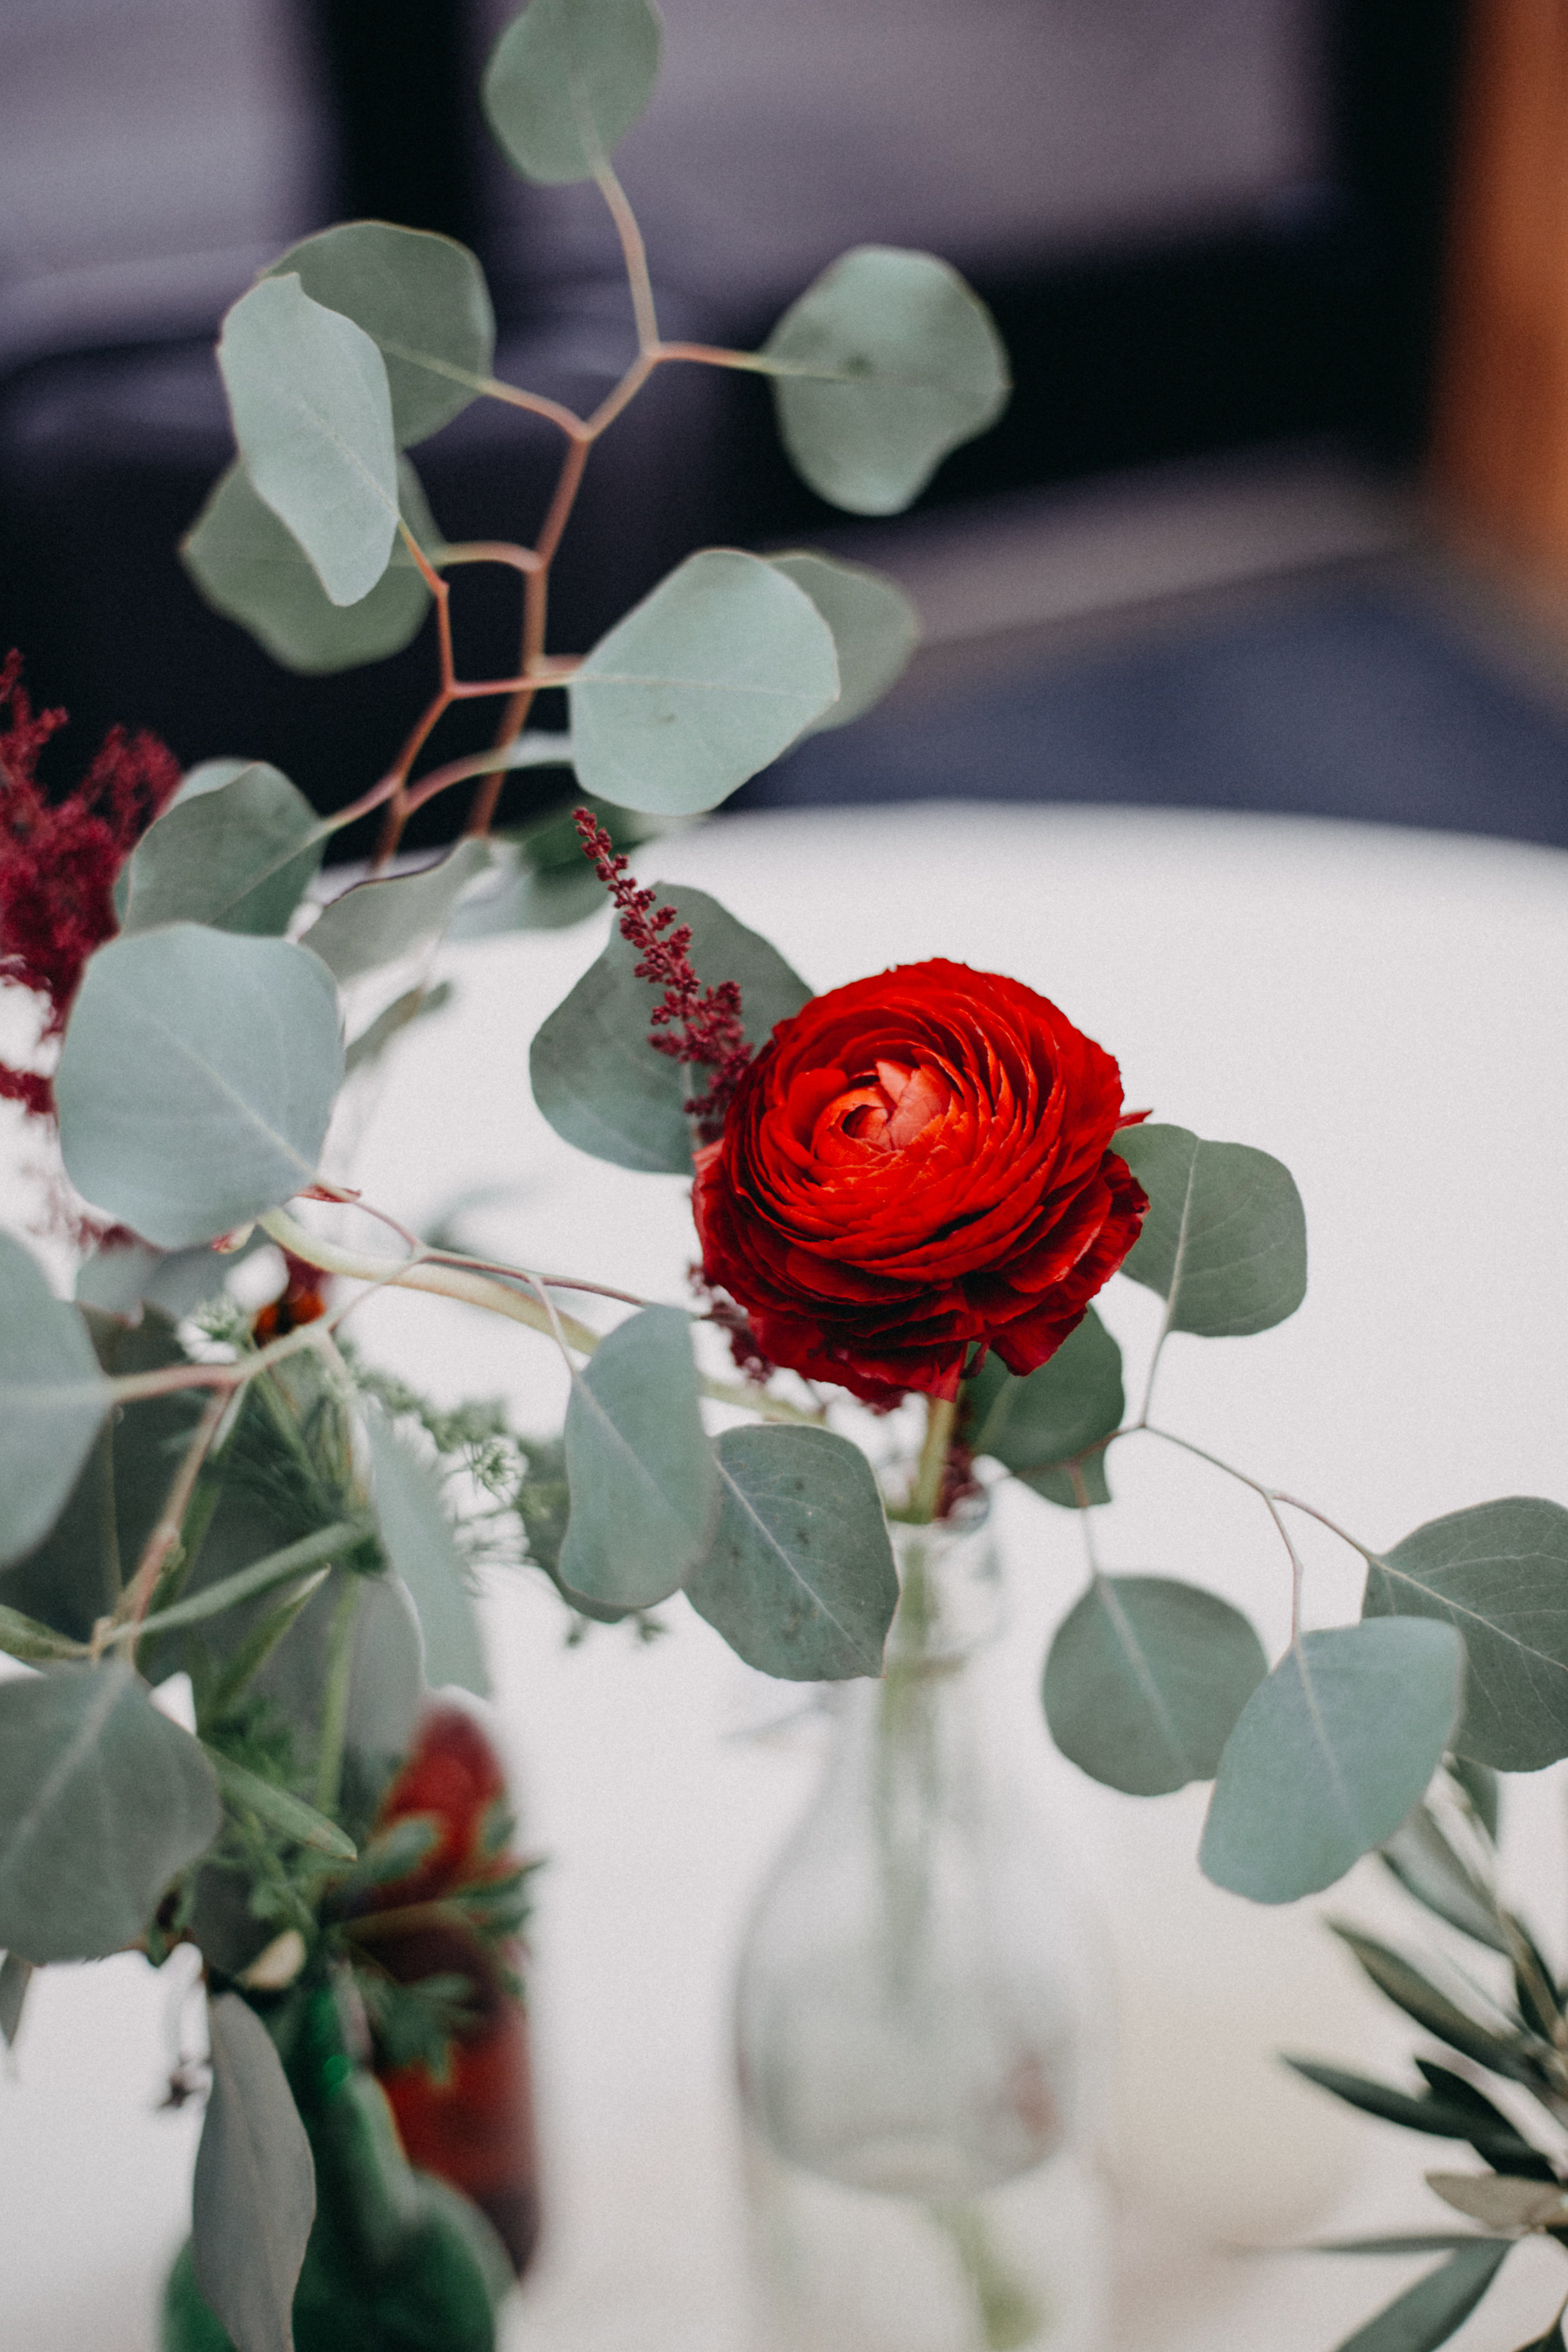 martha+peder43.jpgFern and floret botanical mn fern + floret minnesota wedding florist floral design mn minneapolis mpls st paul sharayah krautkremer britt dezeeuw photography northland arboretum